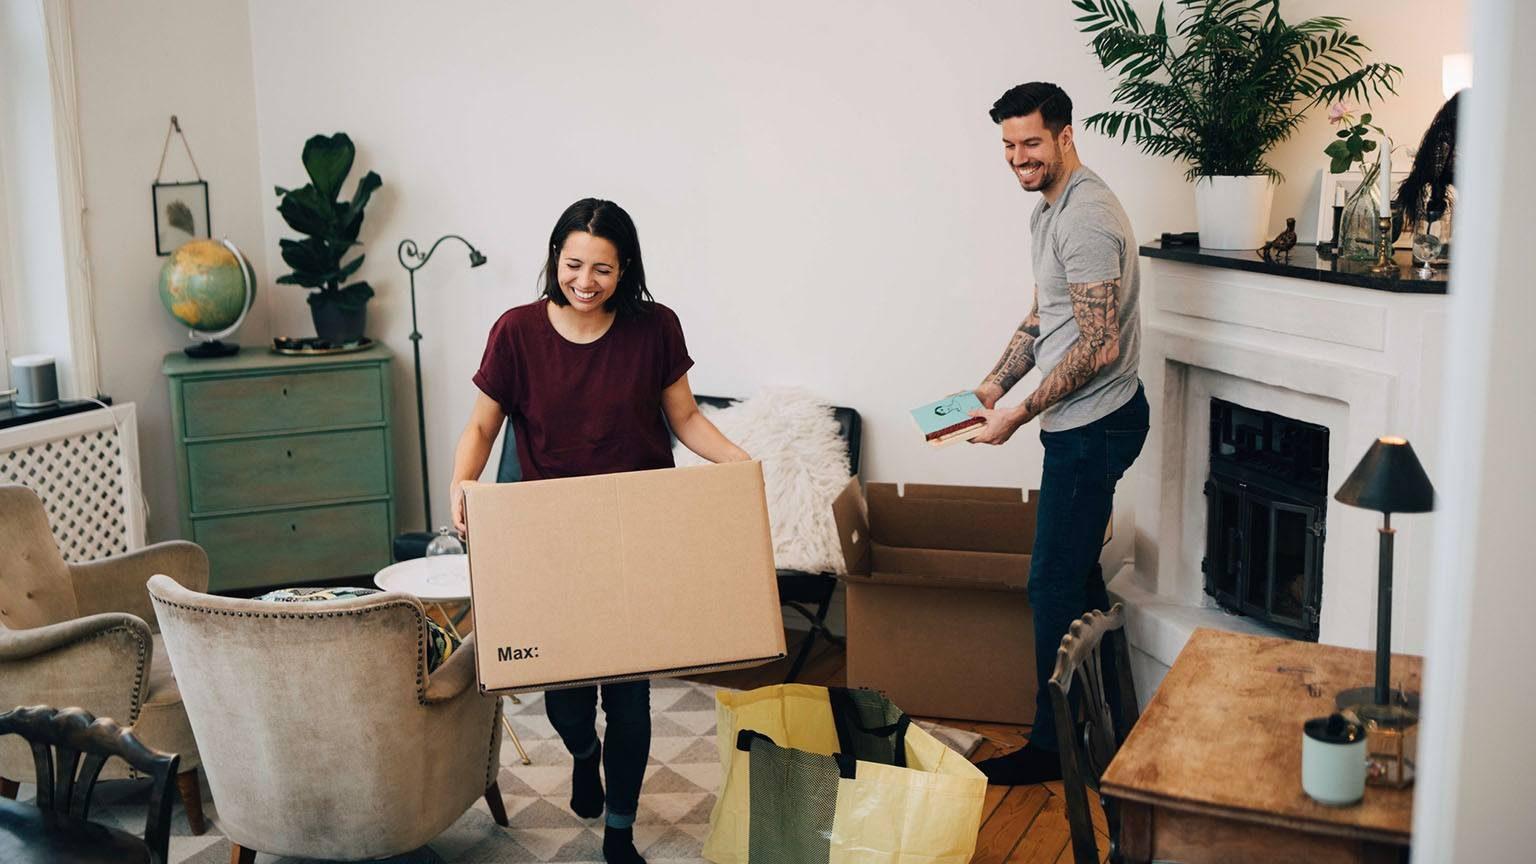 Couple unpacking boxes